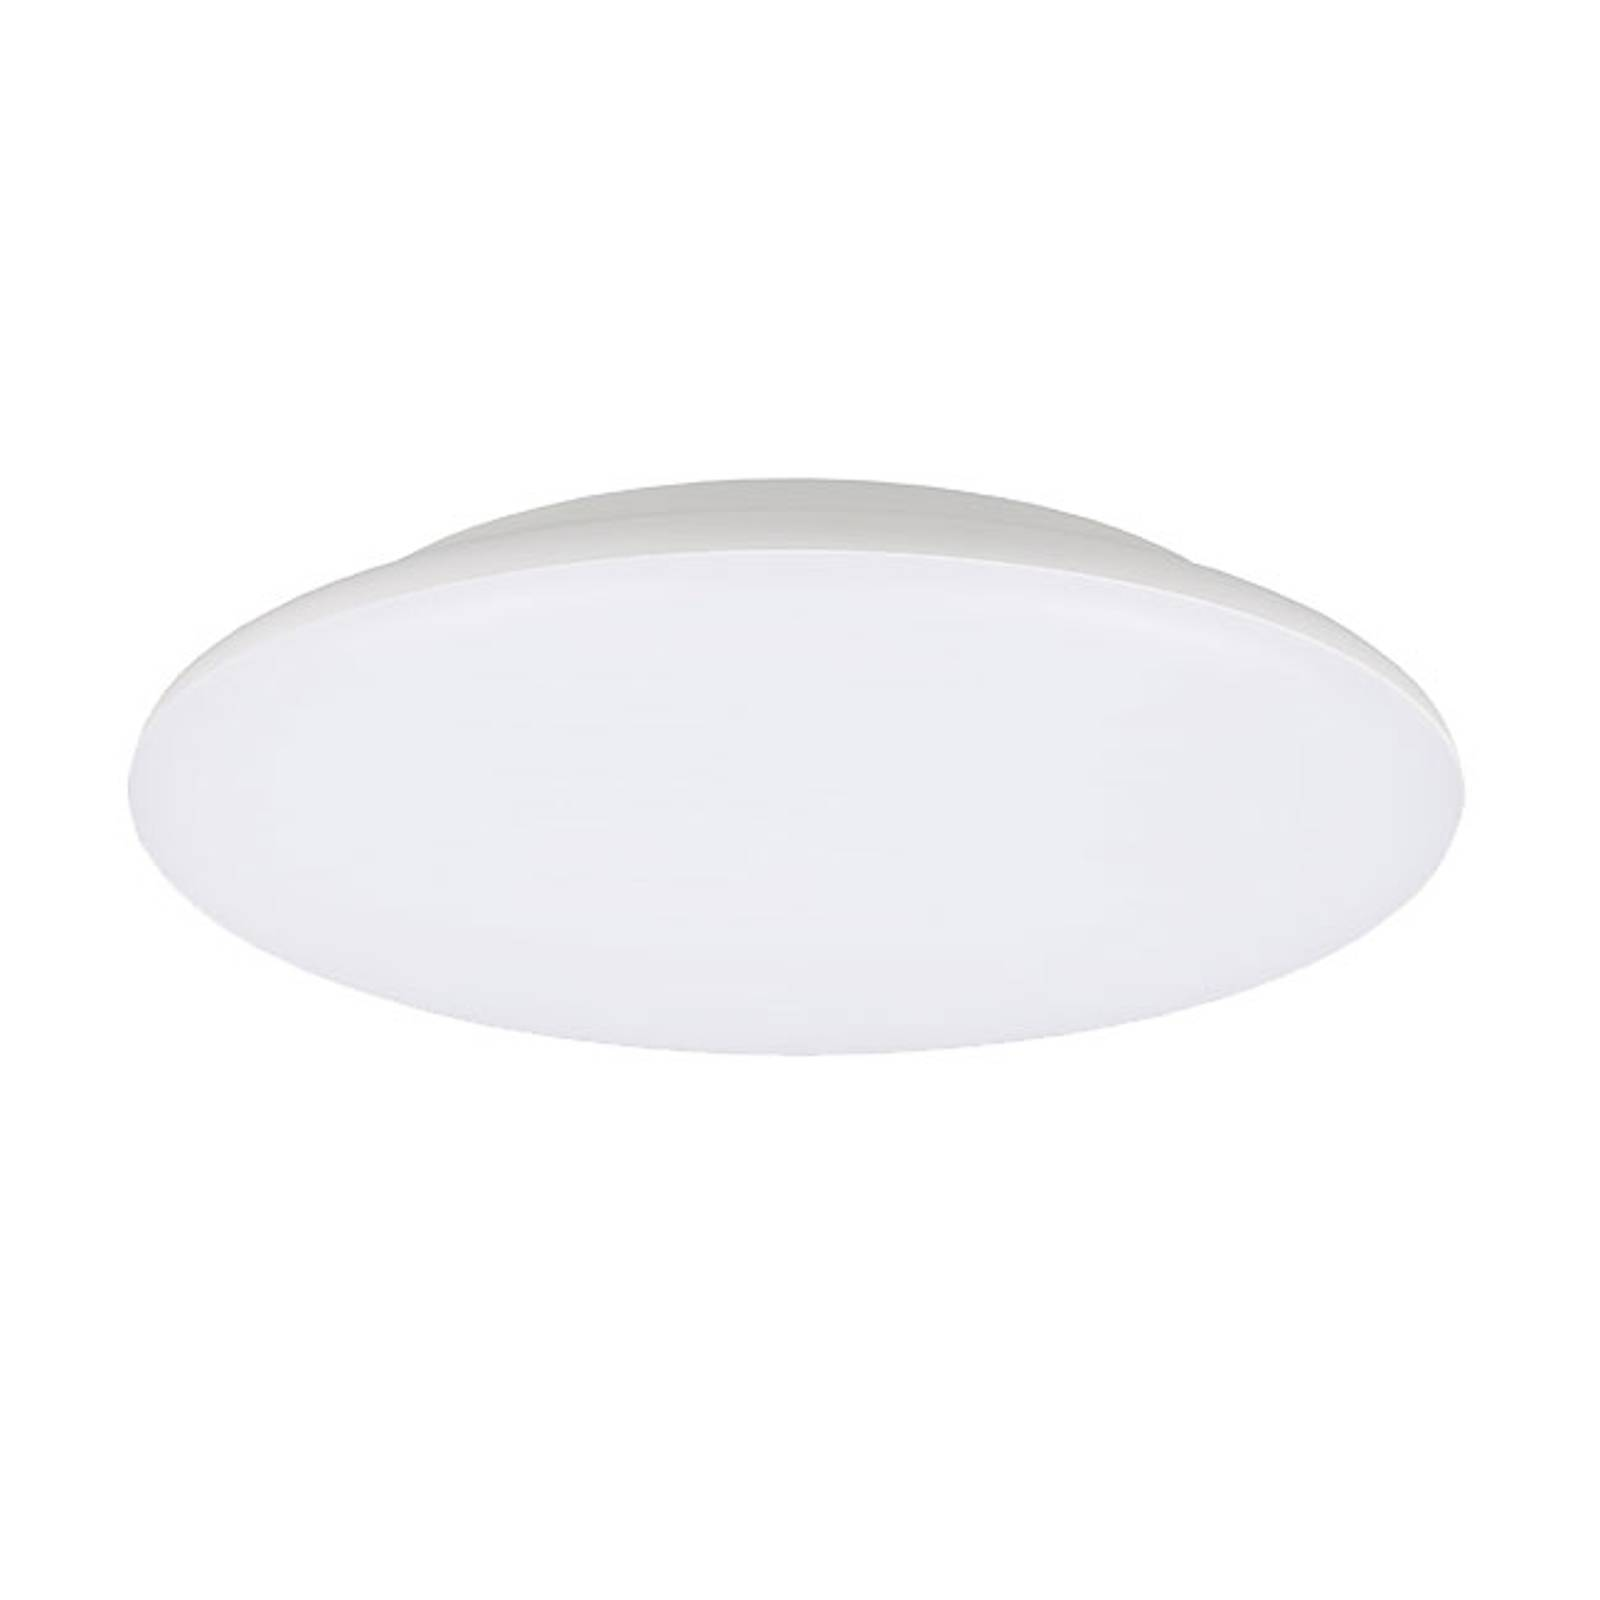 Arcchio Samory LED-Deckenleuchte, Ø 25 cm